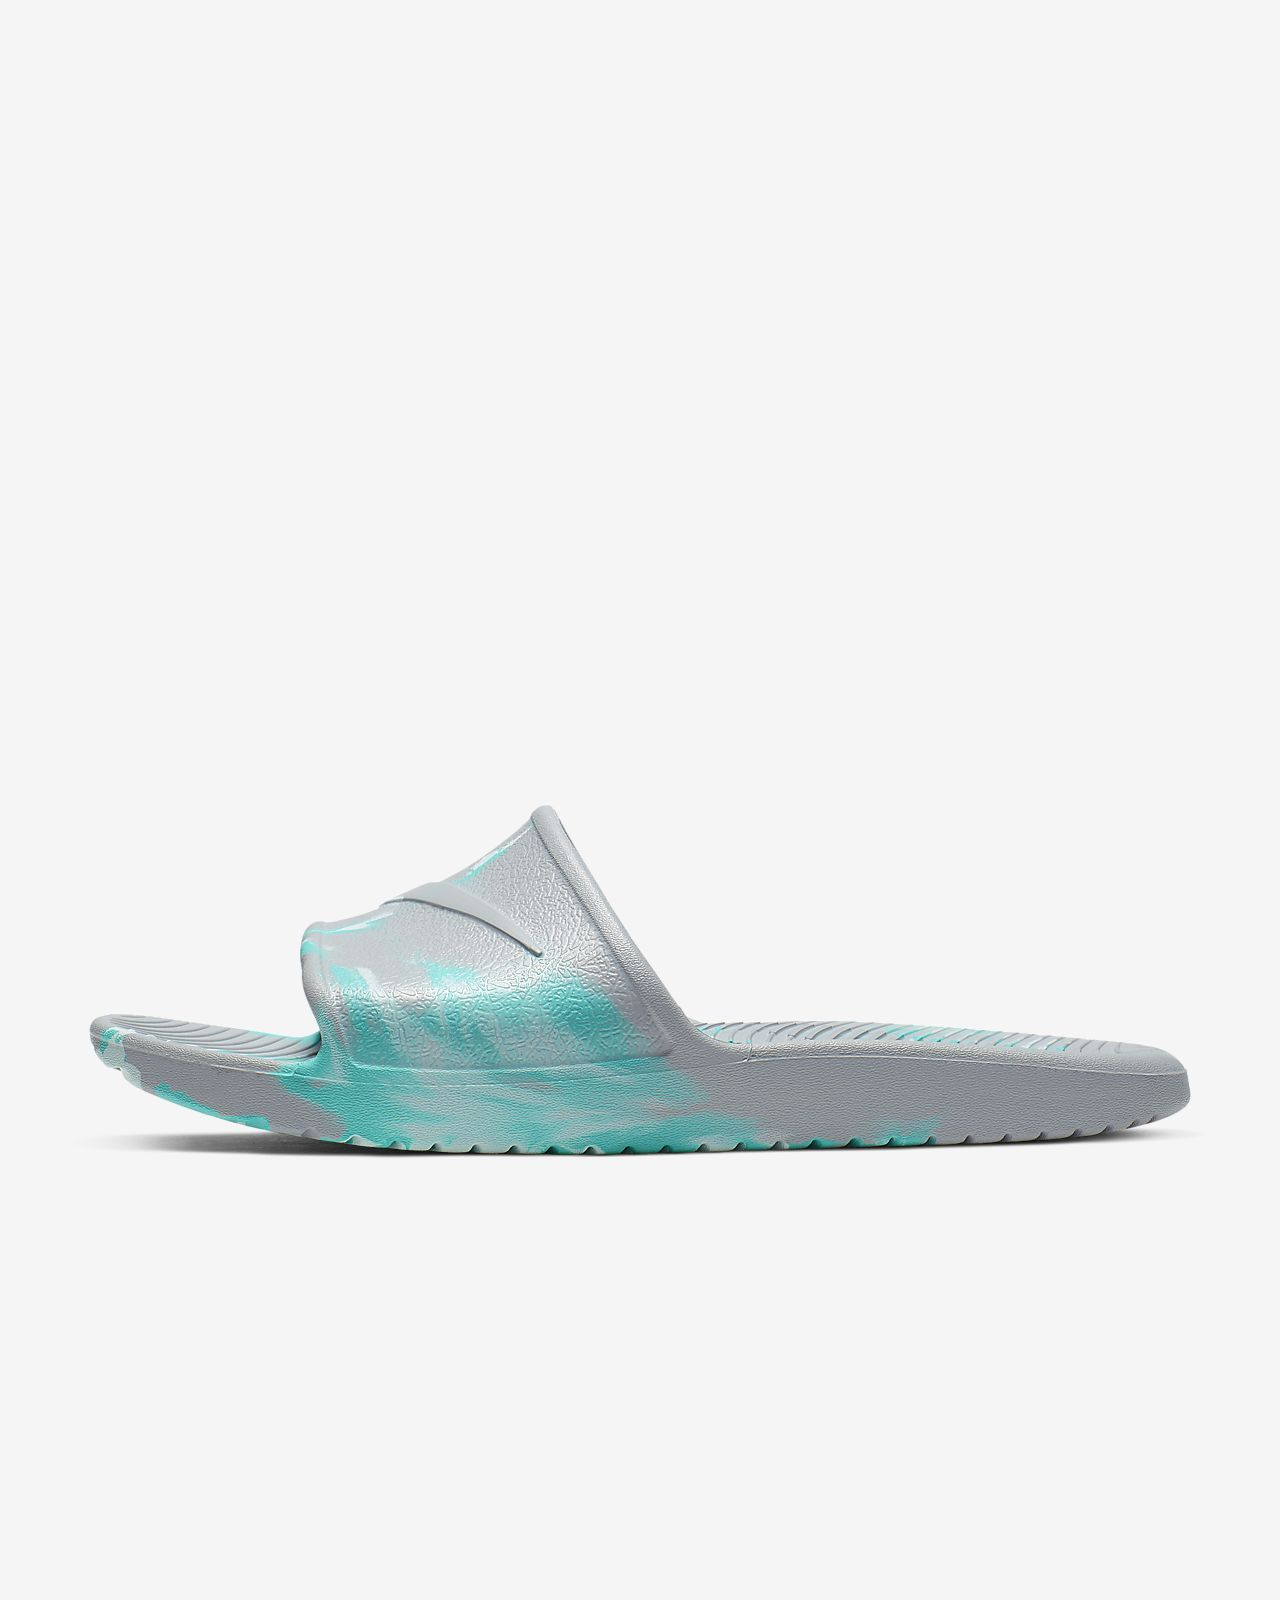 b54187a7d76 Nike Kawa Shower Marble Women s Slide. Nike.com IN